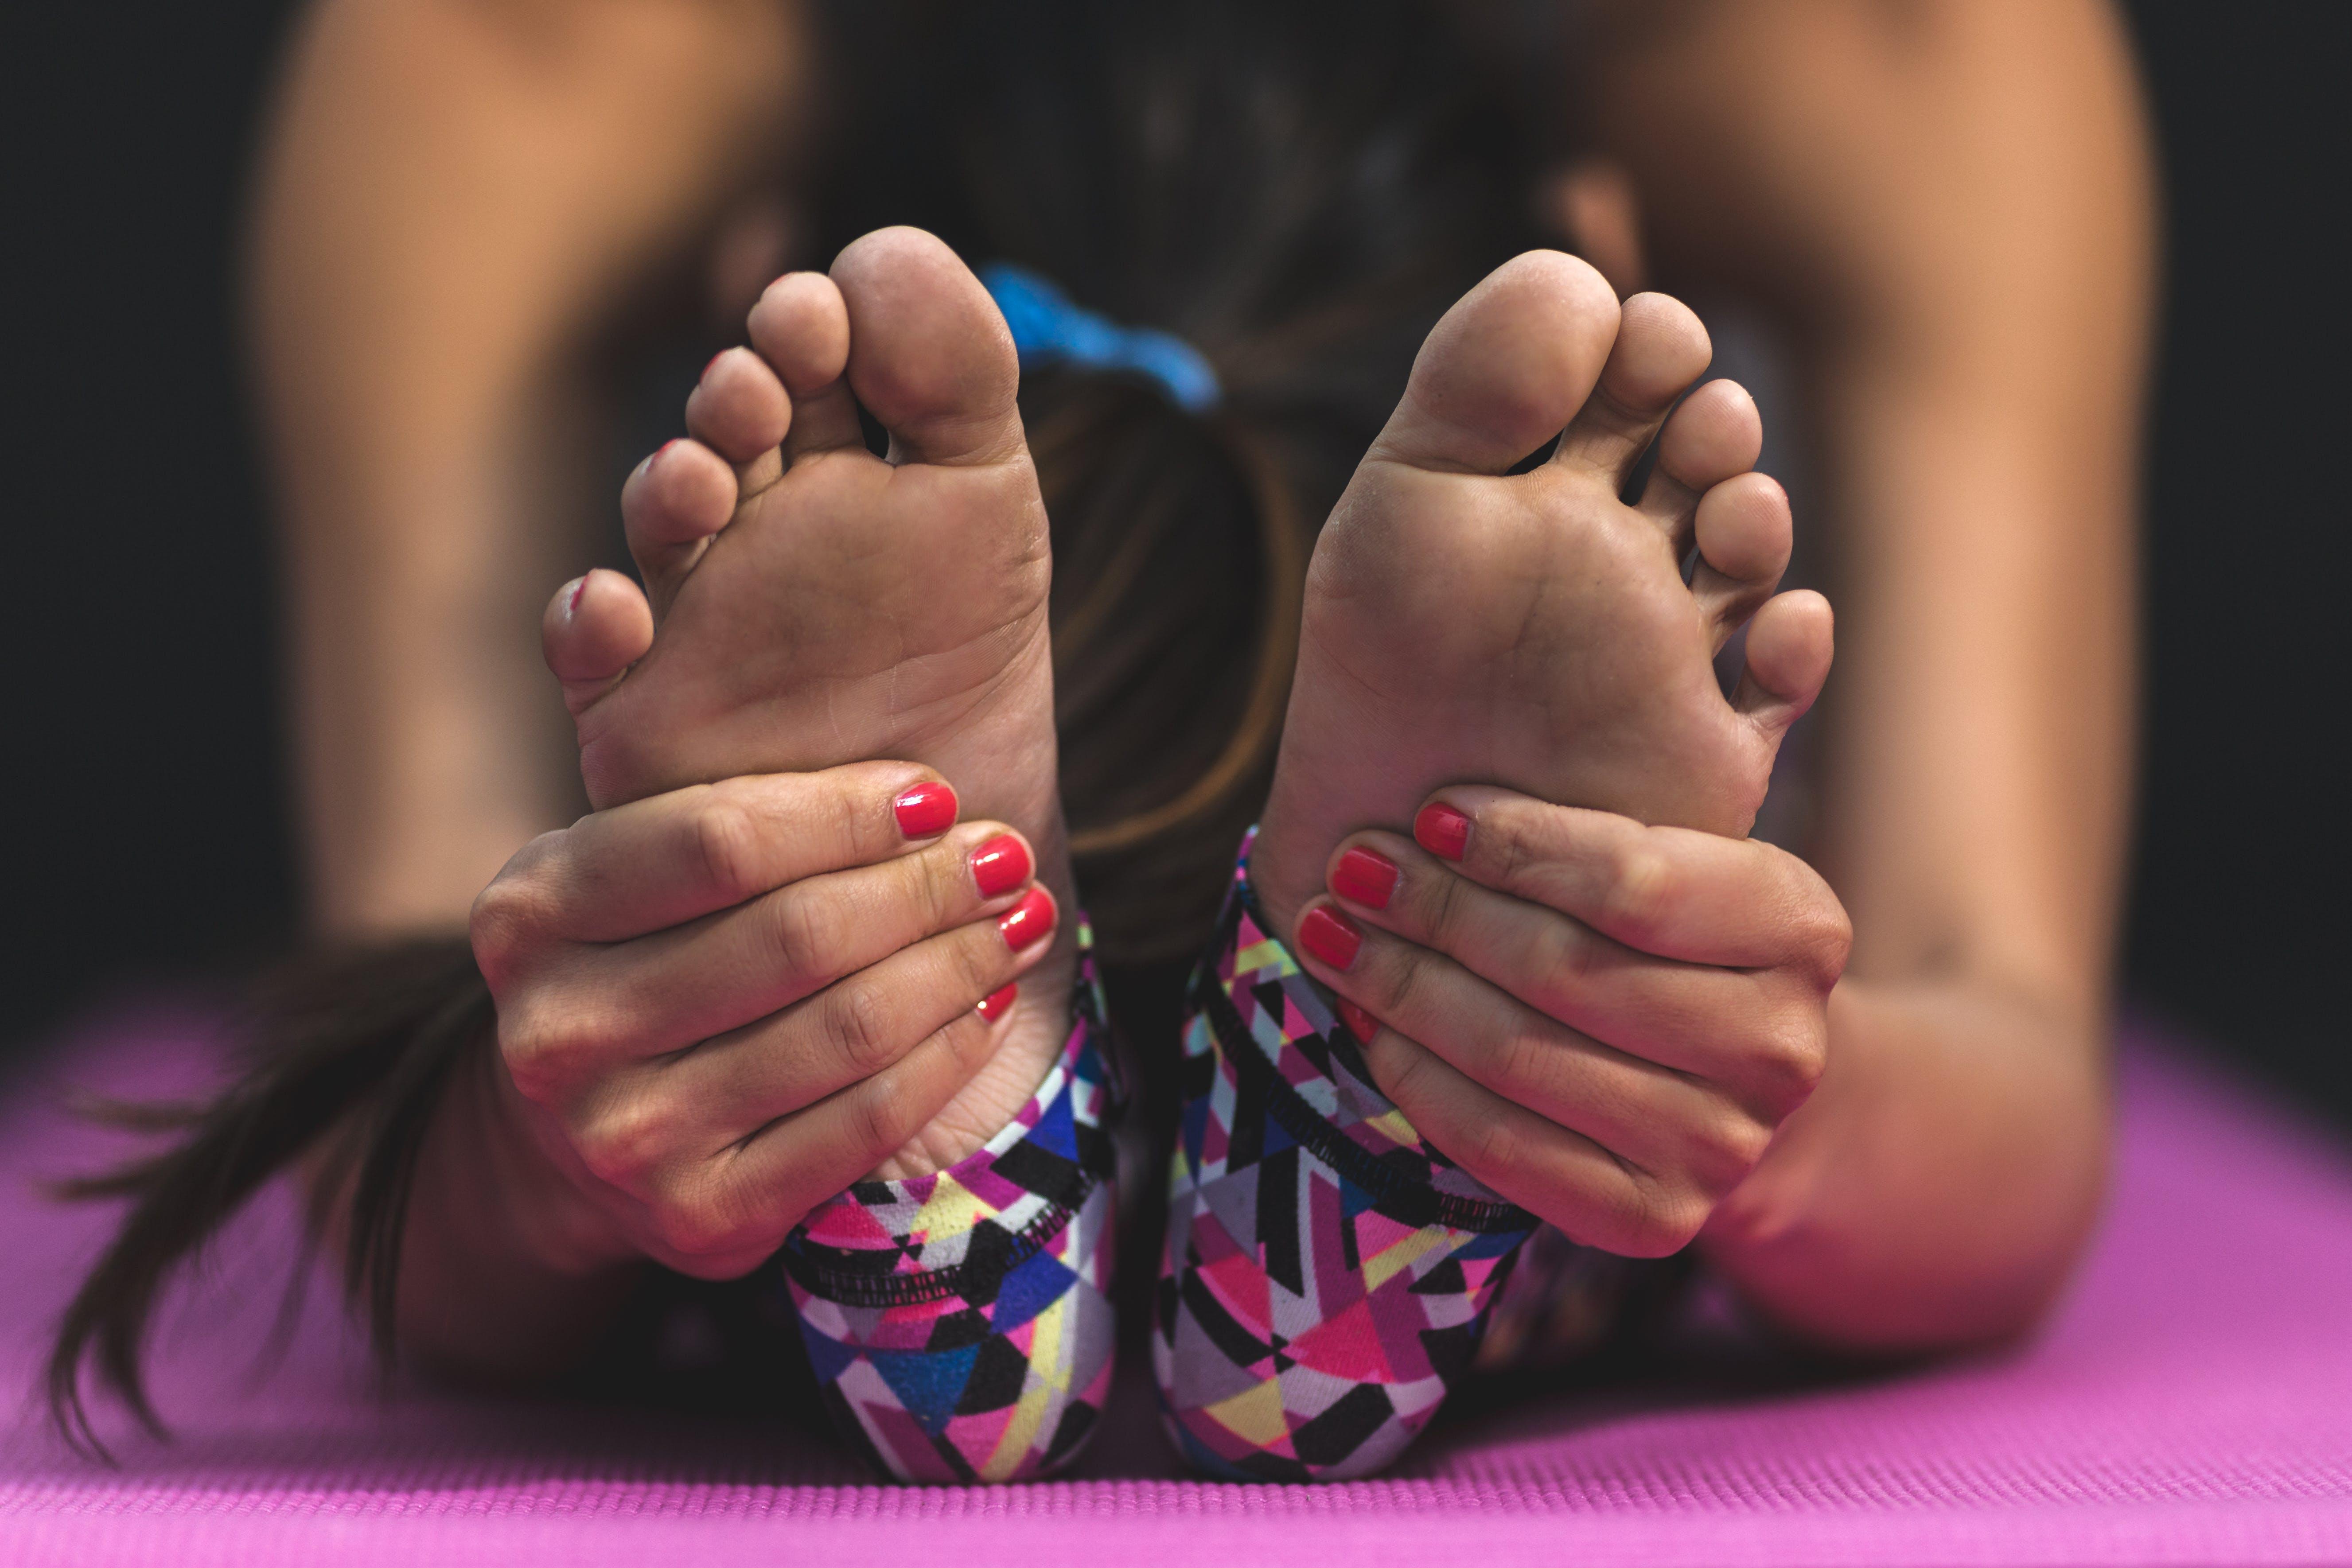 Woman Wearing Multicolored Leggings